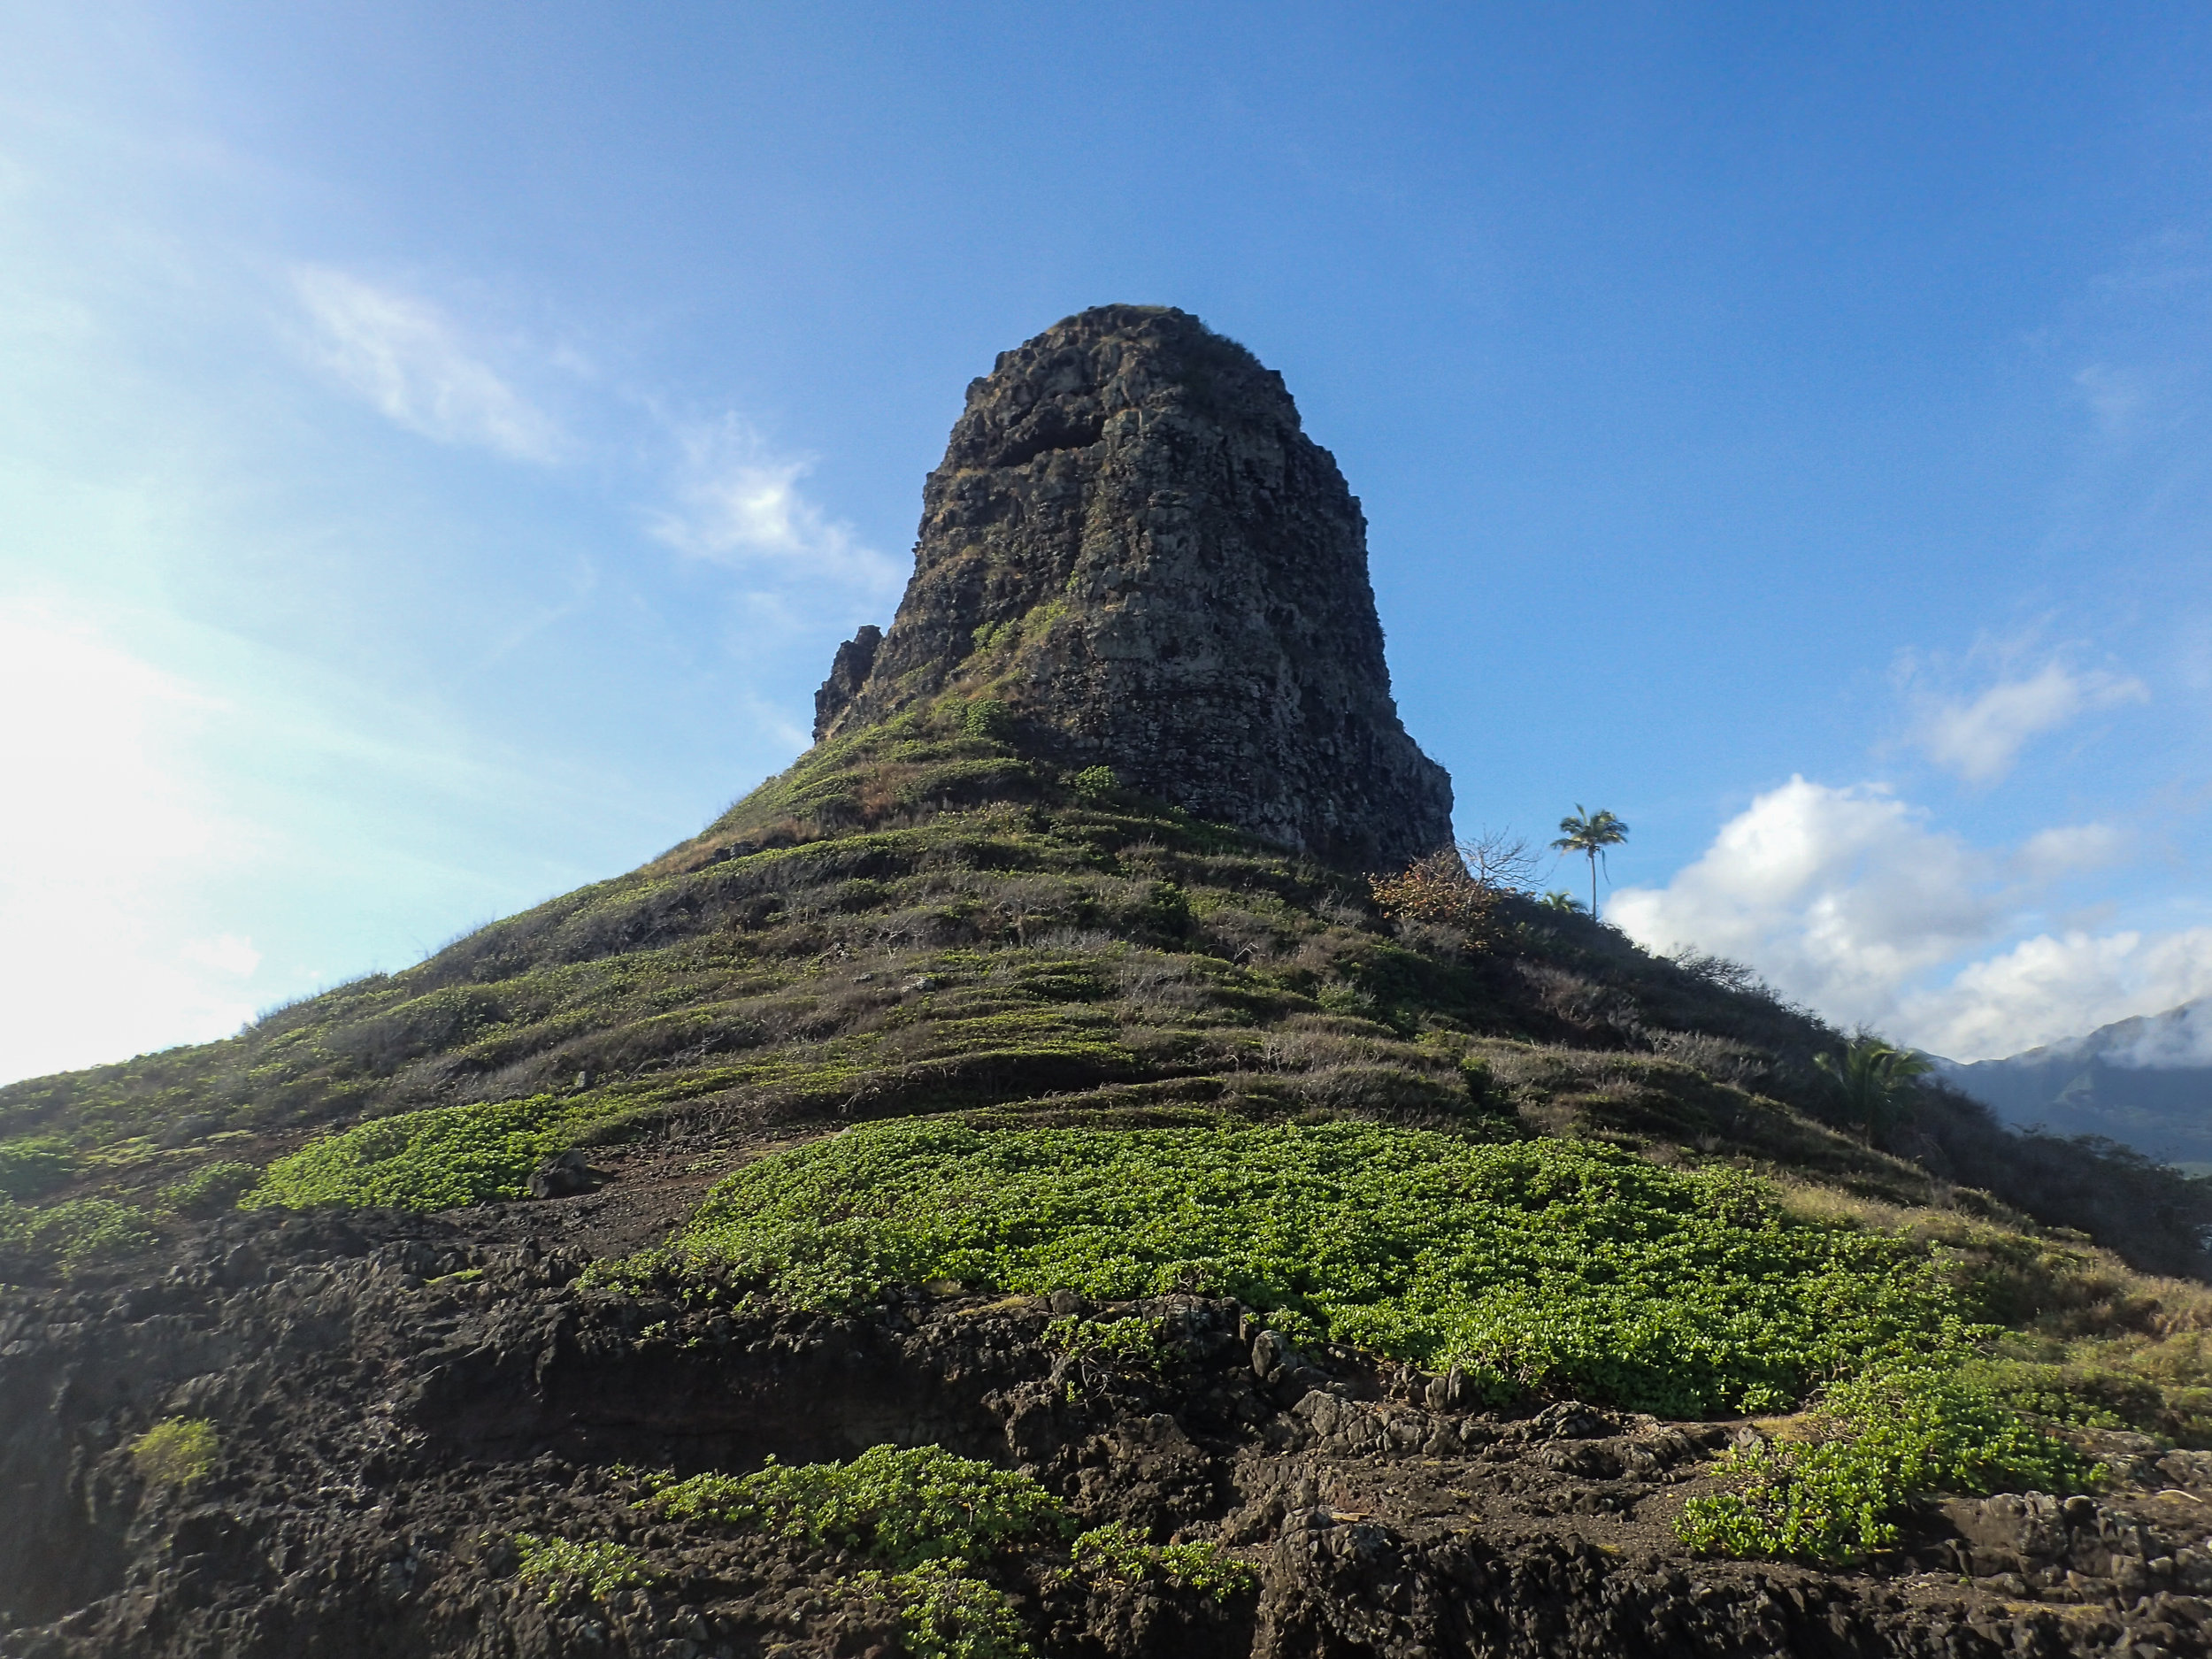 P_Tr_HI_Oahu_Olympus Images-249.jpg